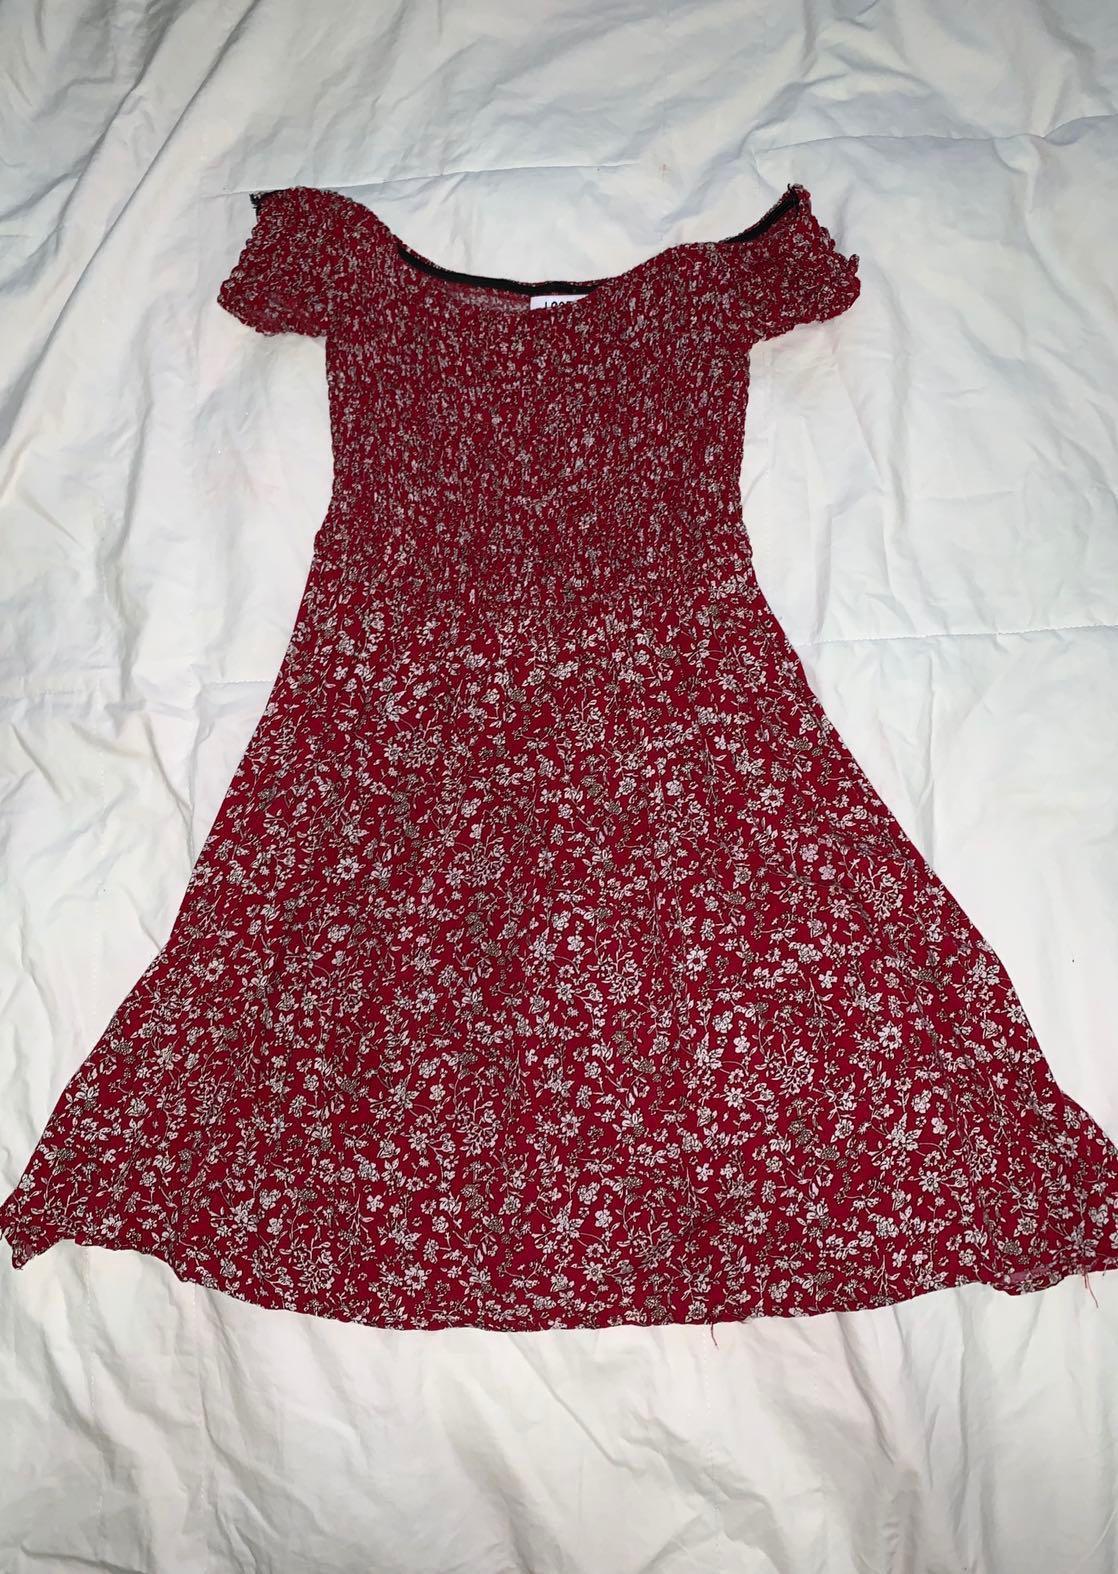 Lost Muse Bardot Red Floral Mini Dress - AU Size 10